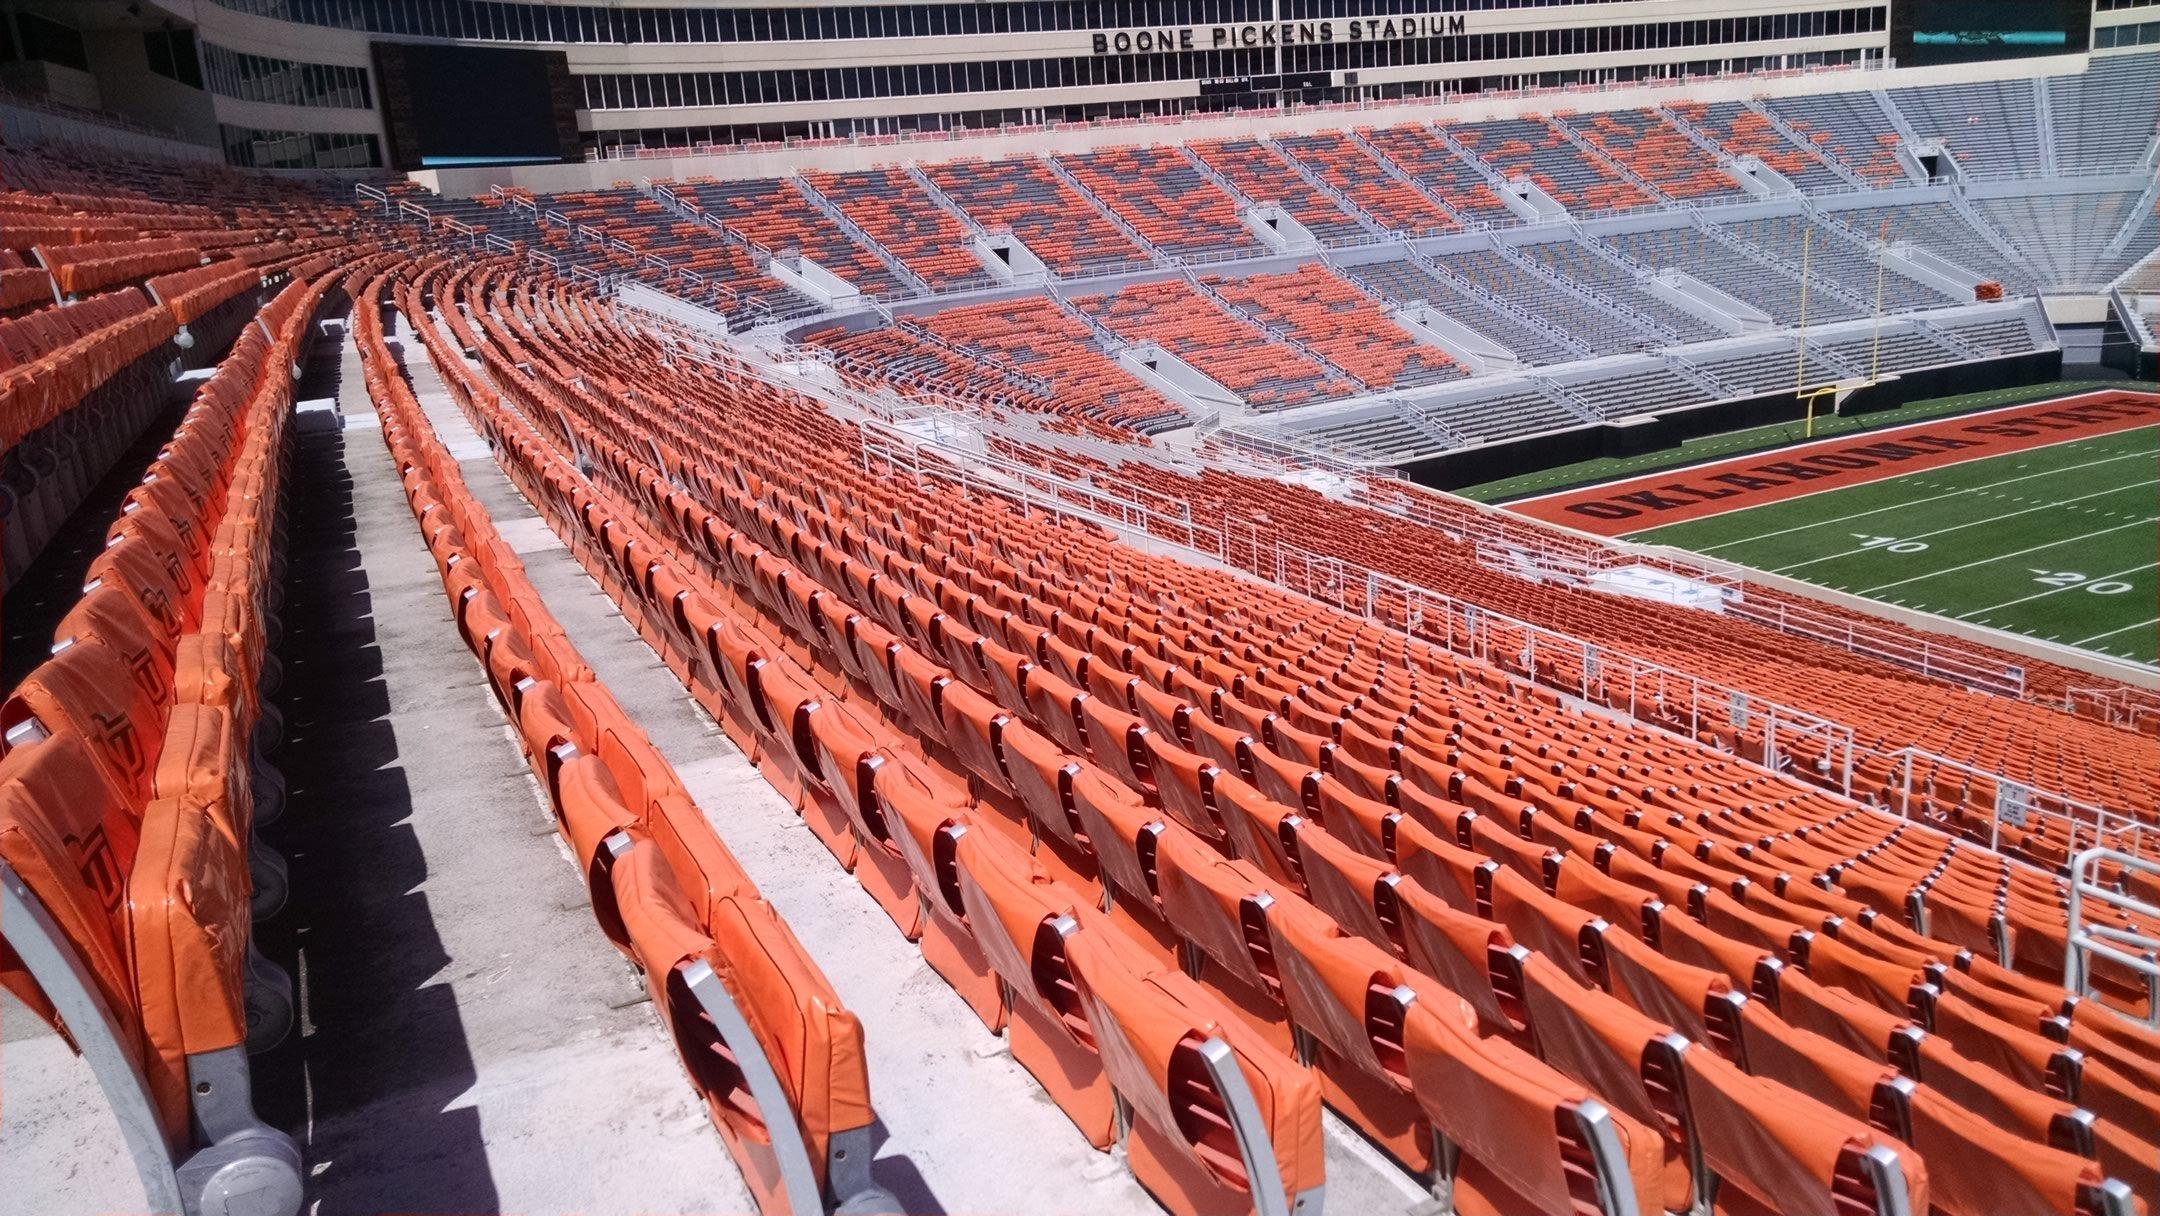 300 Level Seats